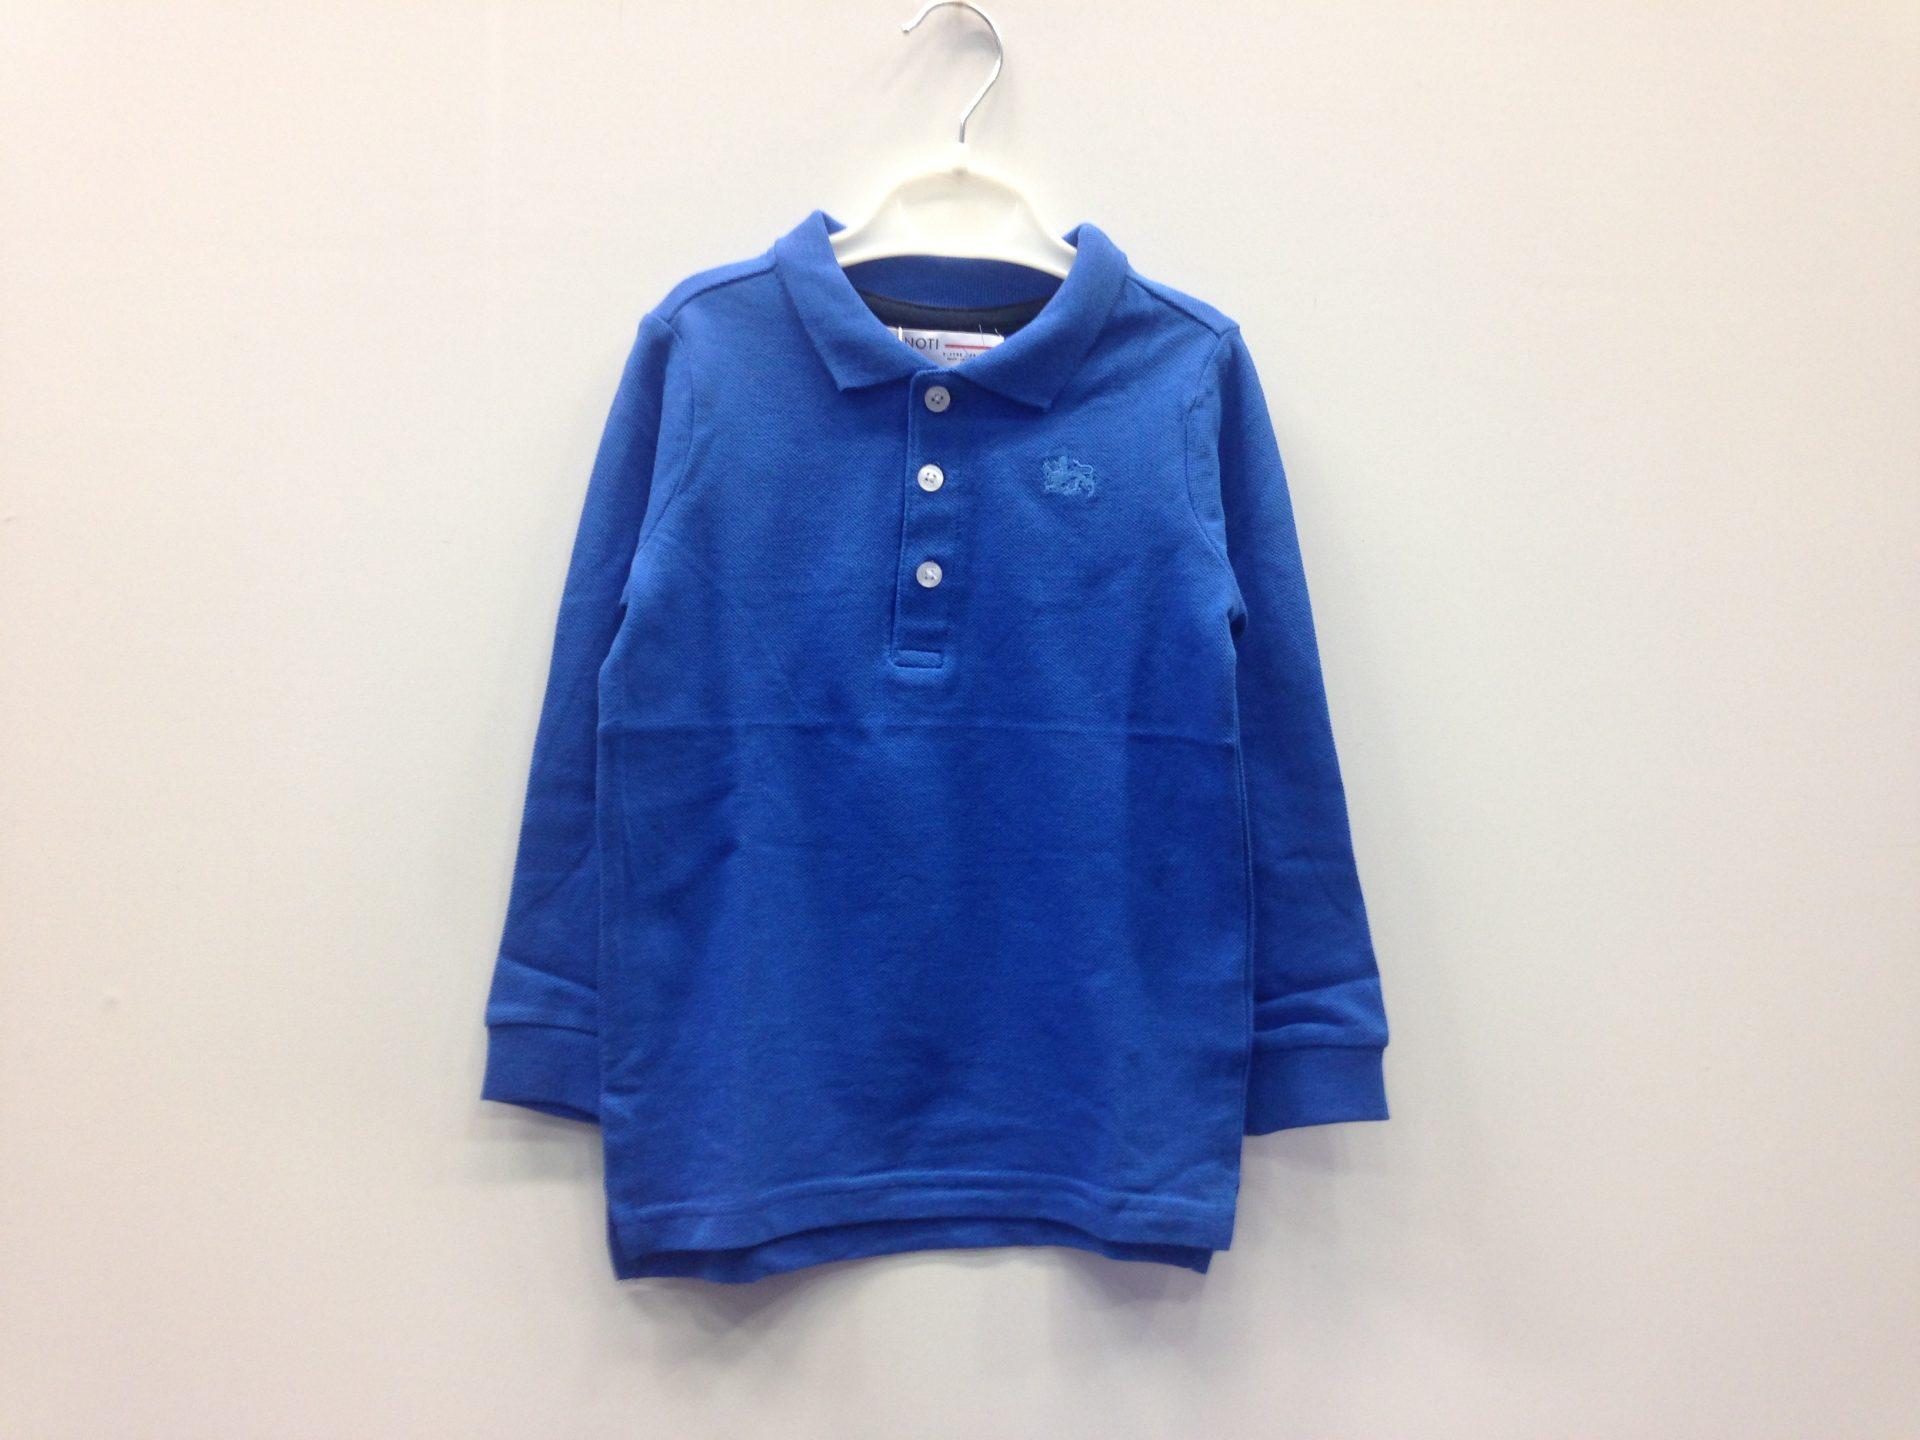 5297472bc08 MINOTI μπλούζα πόλο μ/μ ρουα με λευκά κουμπιά